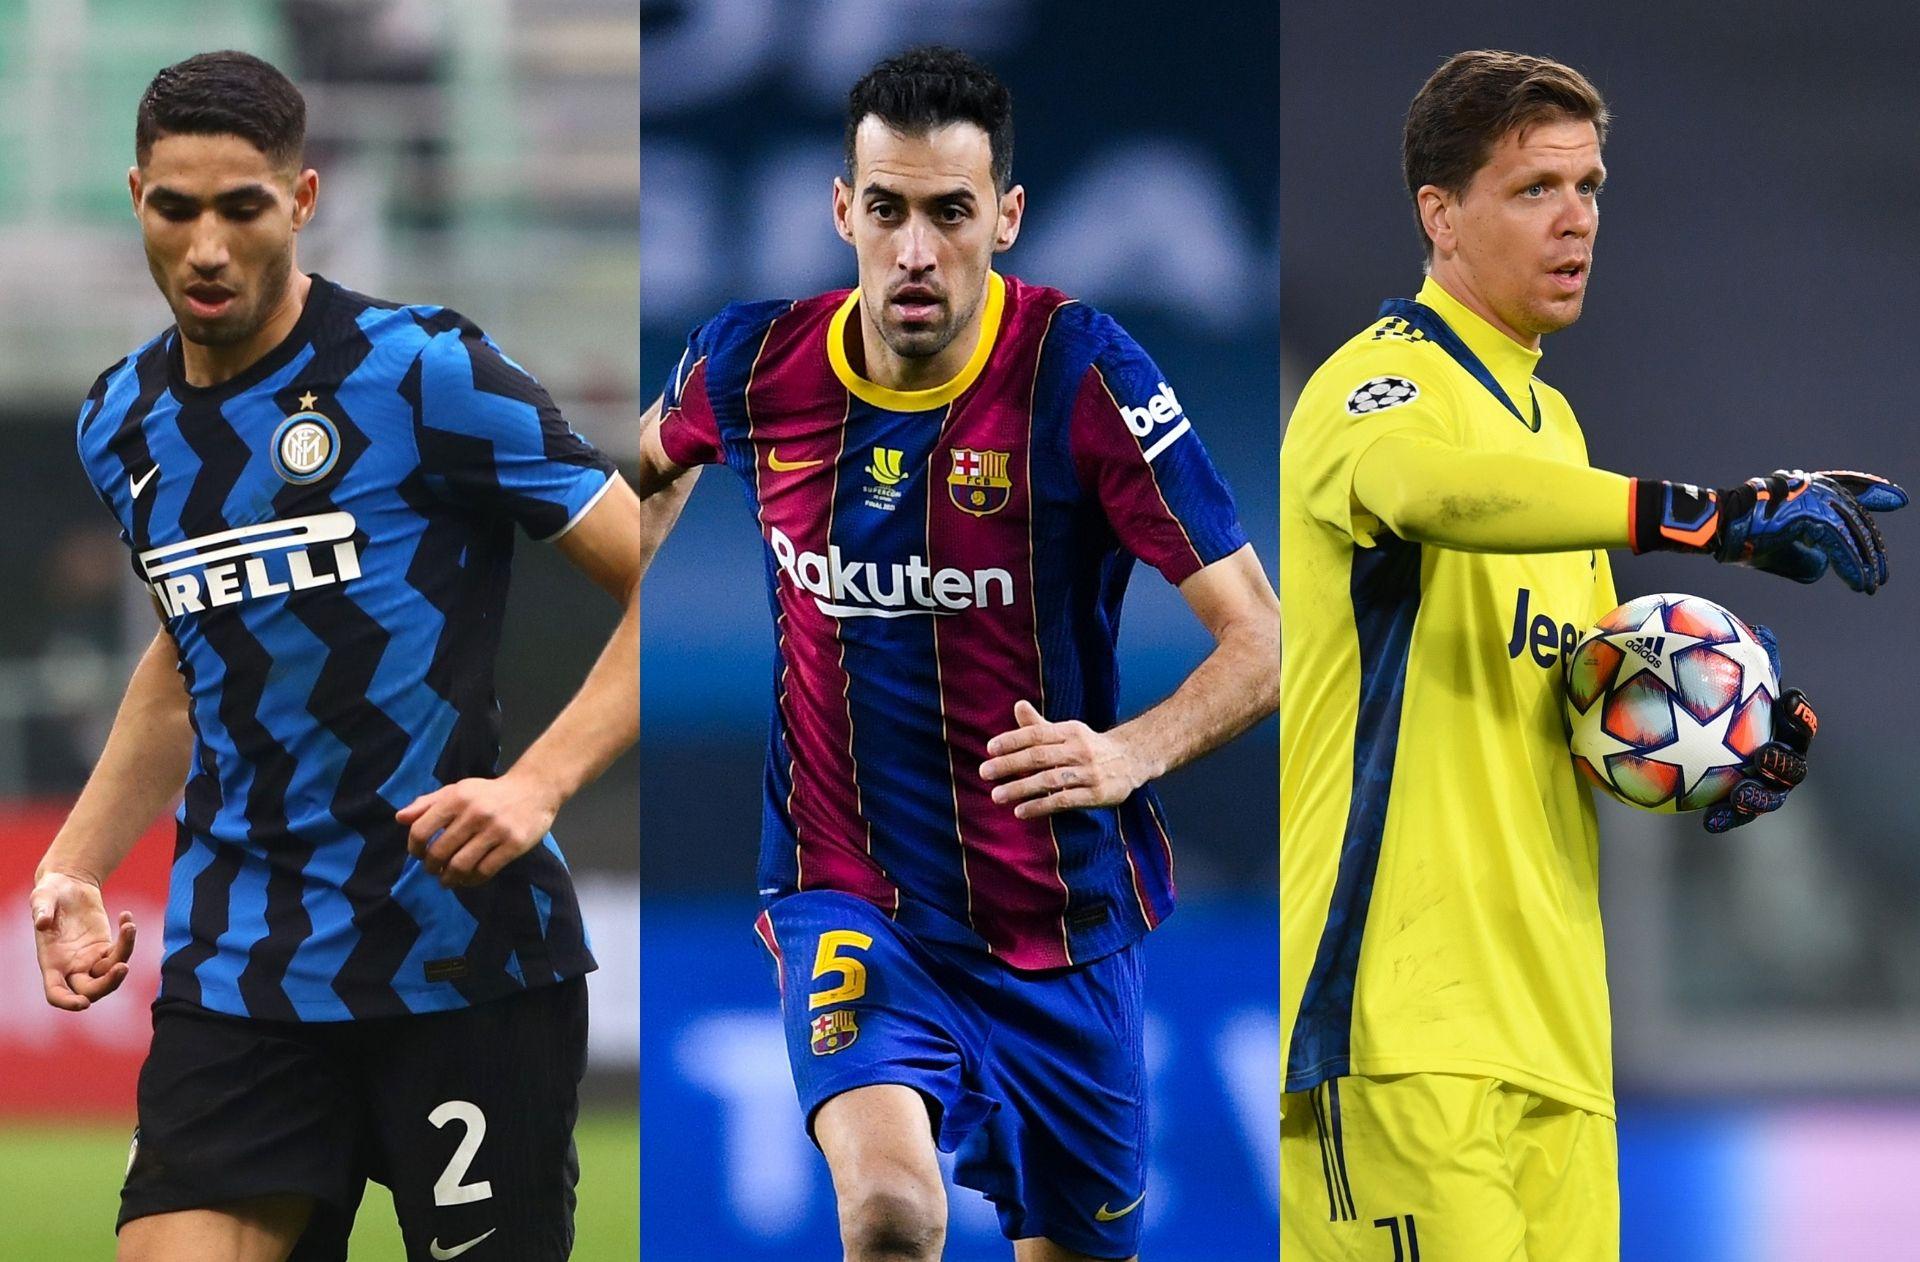 Achraf Hakimi of Inter Milan, Sergio Busquets of Barcelona, Wojciech Szczesny of Juventus